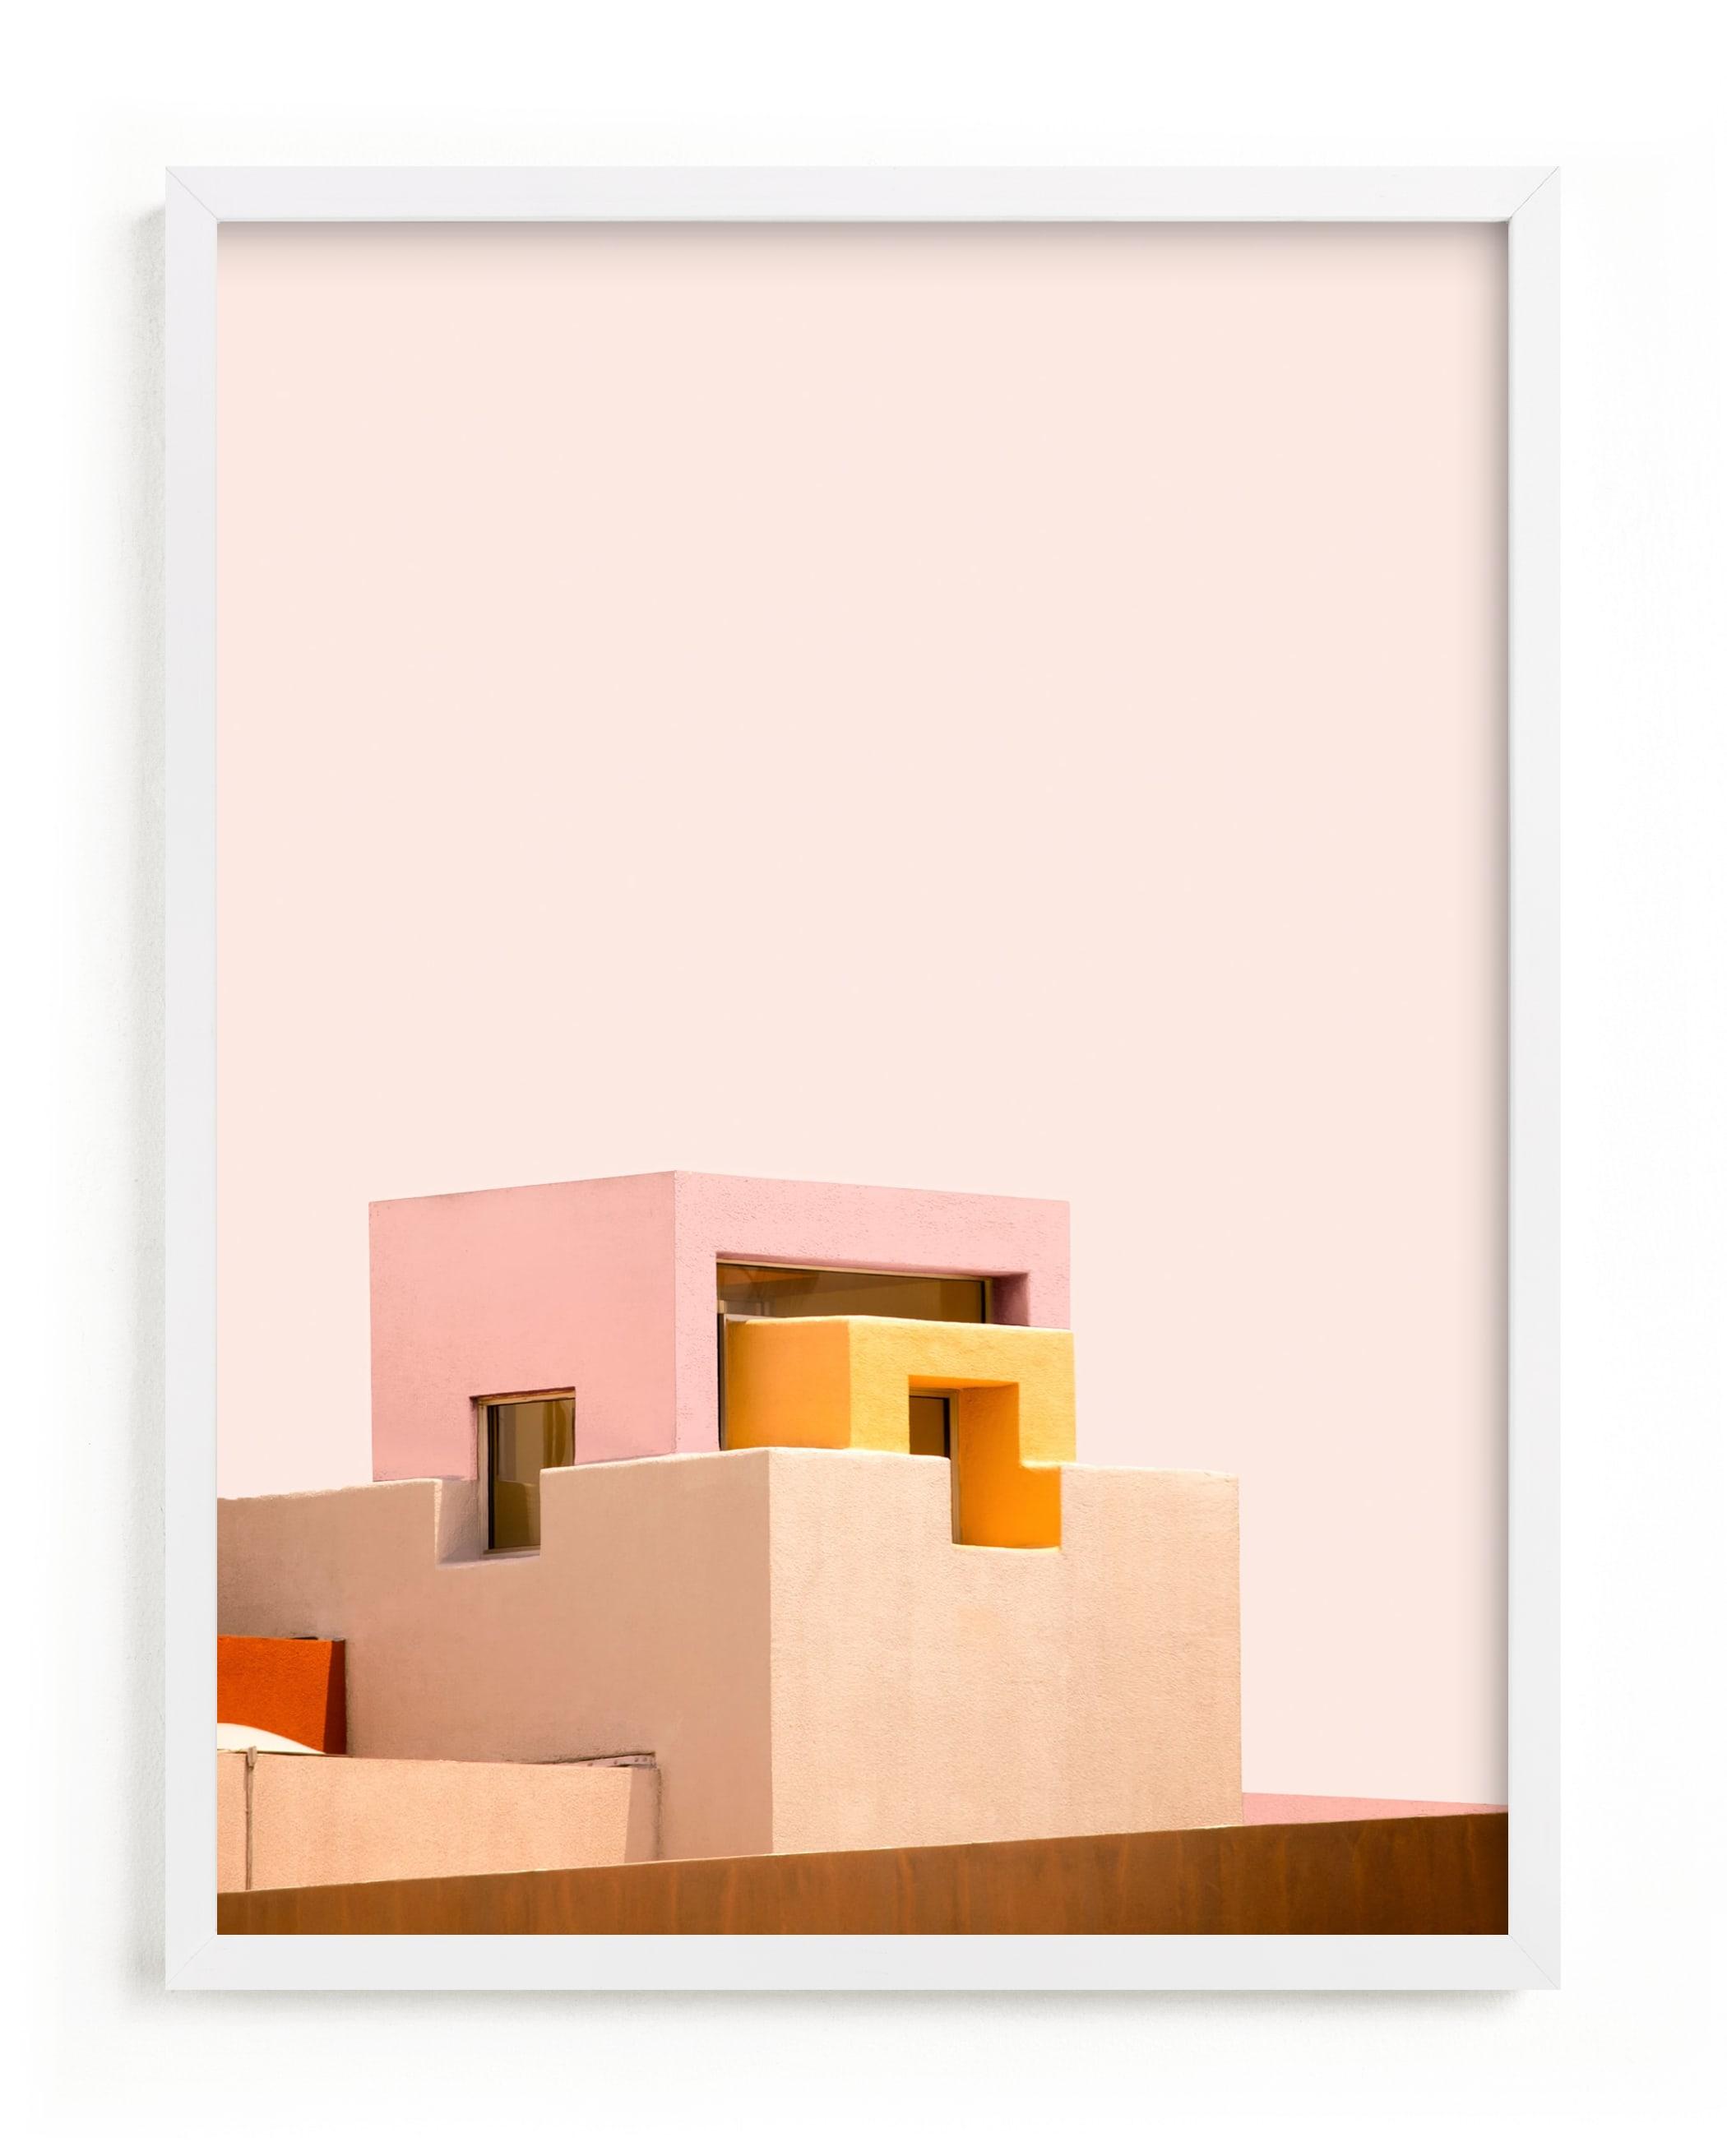 This is a pink art by Lisa Sundin called Urban Desert Series 3.